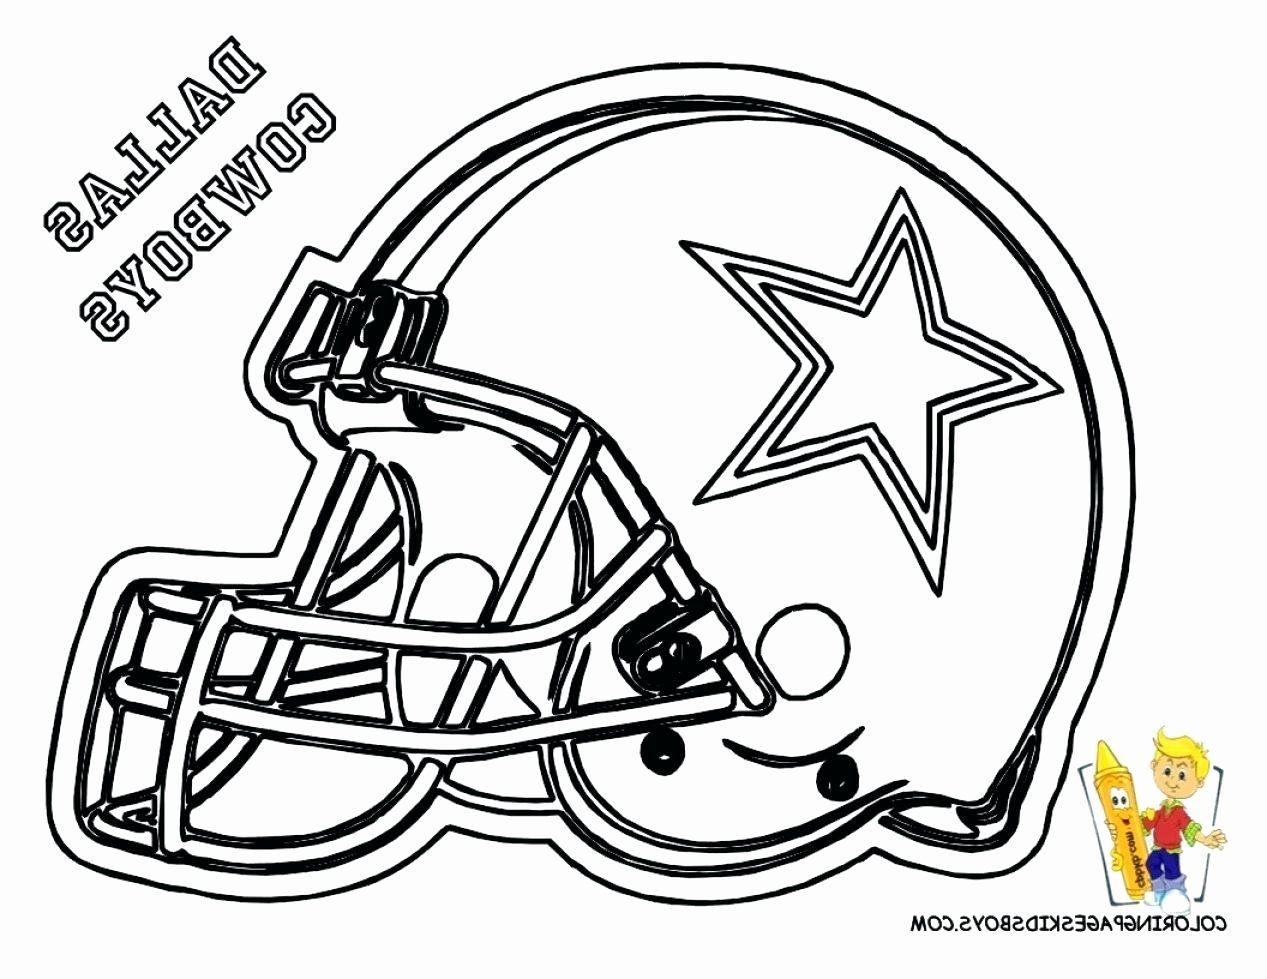 Cardinals Football Coloring Pages Elegant Cowboys Football Coloring Pages Deucesheet Football Coloring Pages Coloring Pages Cardinals Football